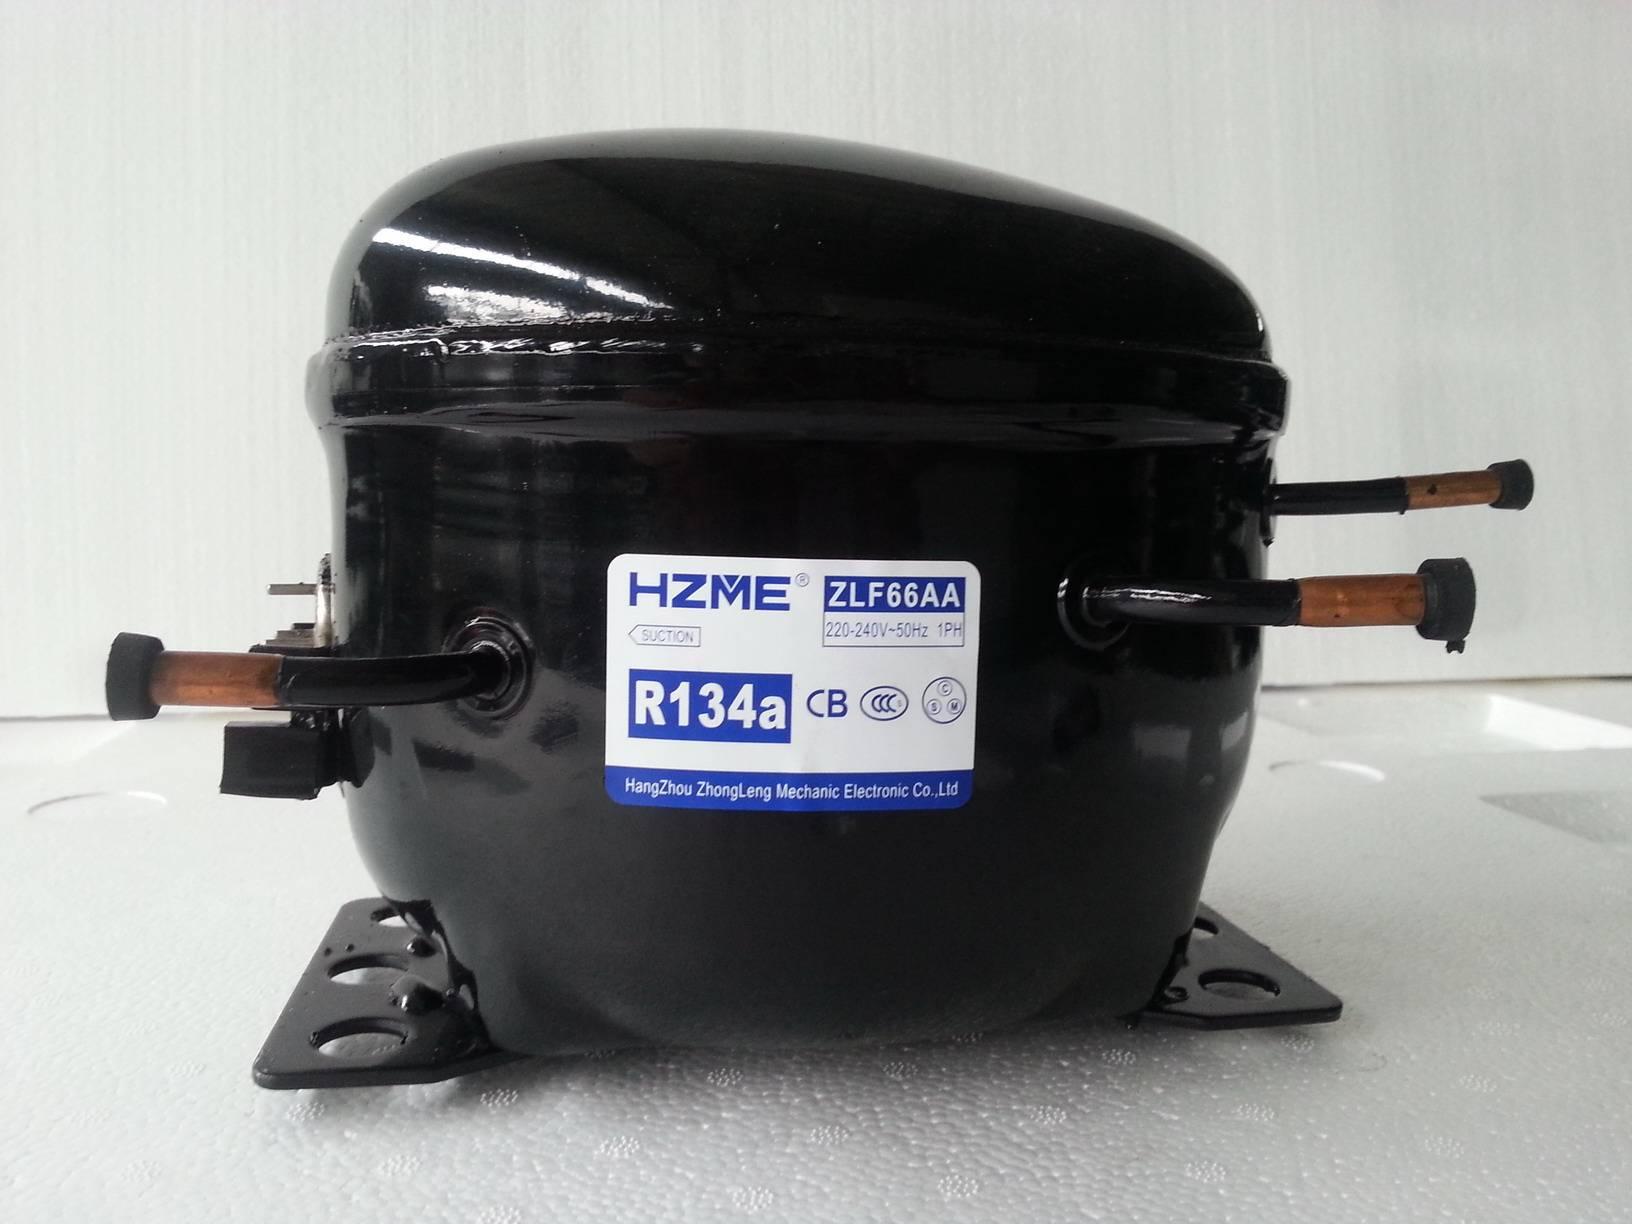 HERMETIC COMPRESSOR R134a  LBP 6.6cc FOR COMMERCIAL REFRIGERATOR